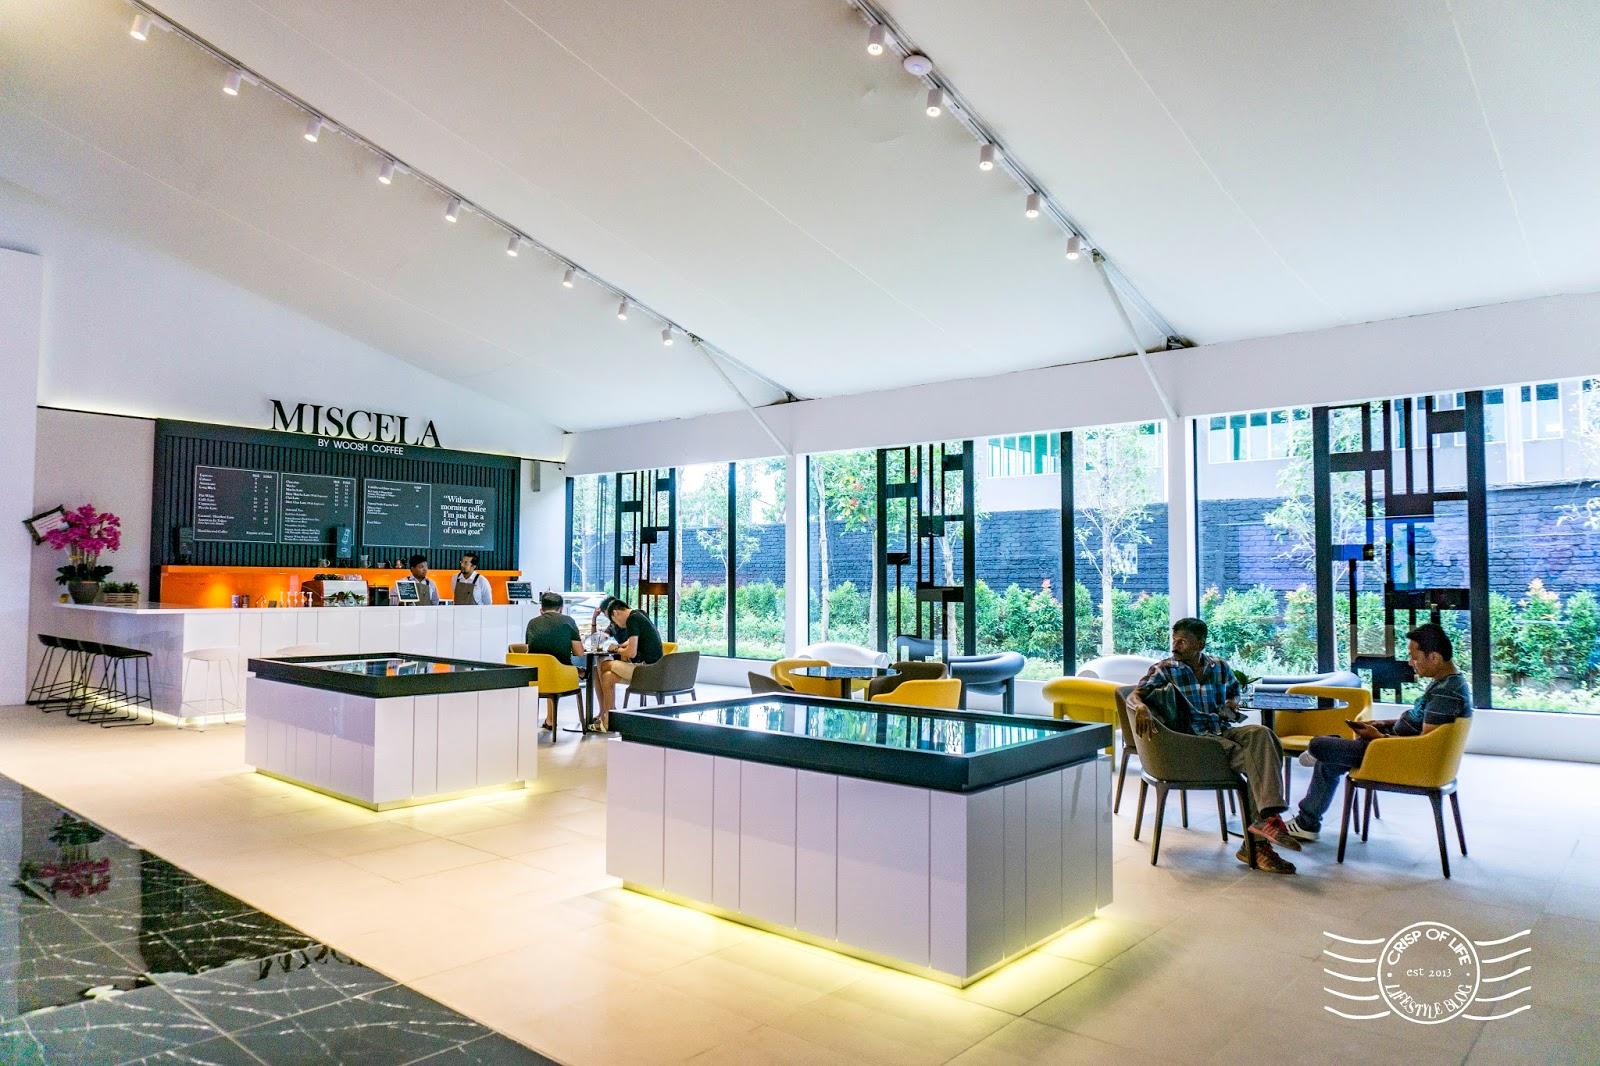 Miscela by Woosh Coffee @ Beacon Concept Gallery, Jalan Sungai Pinang